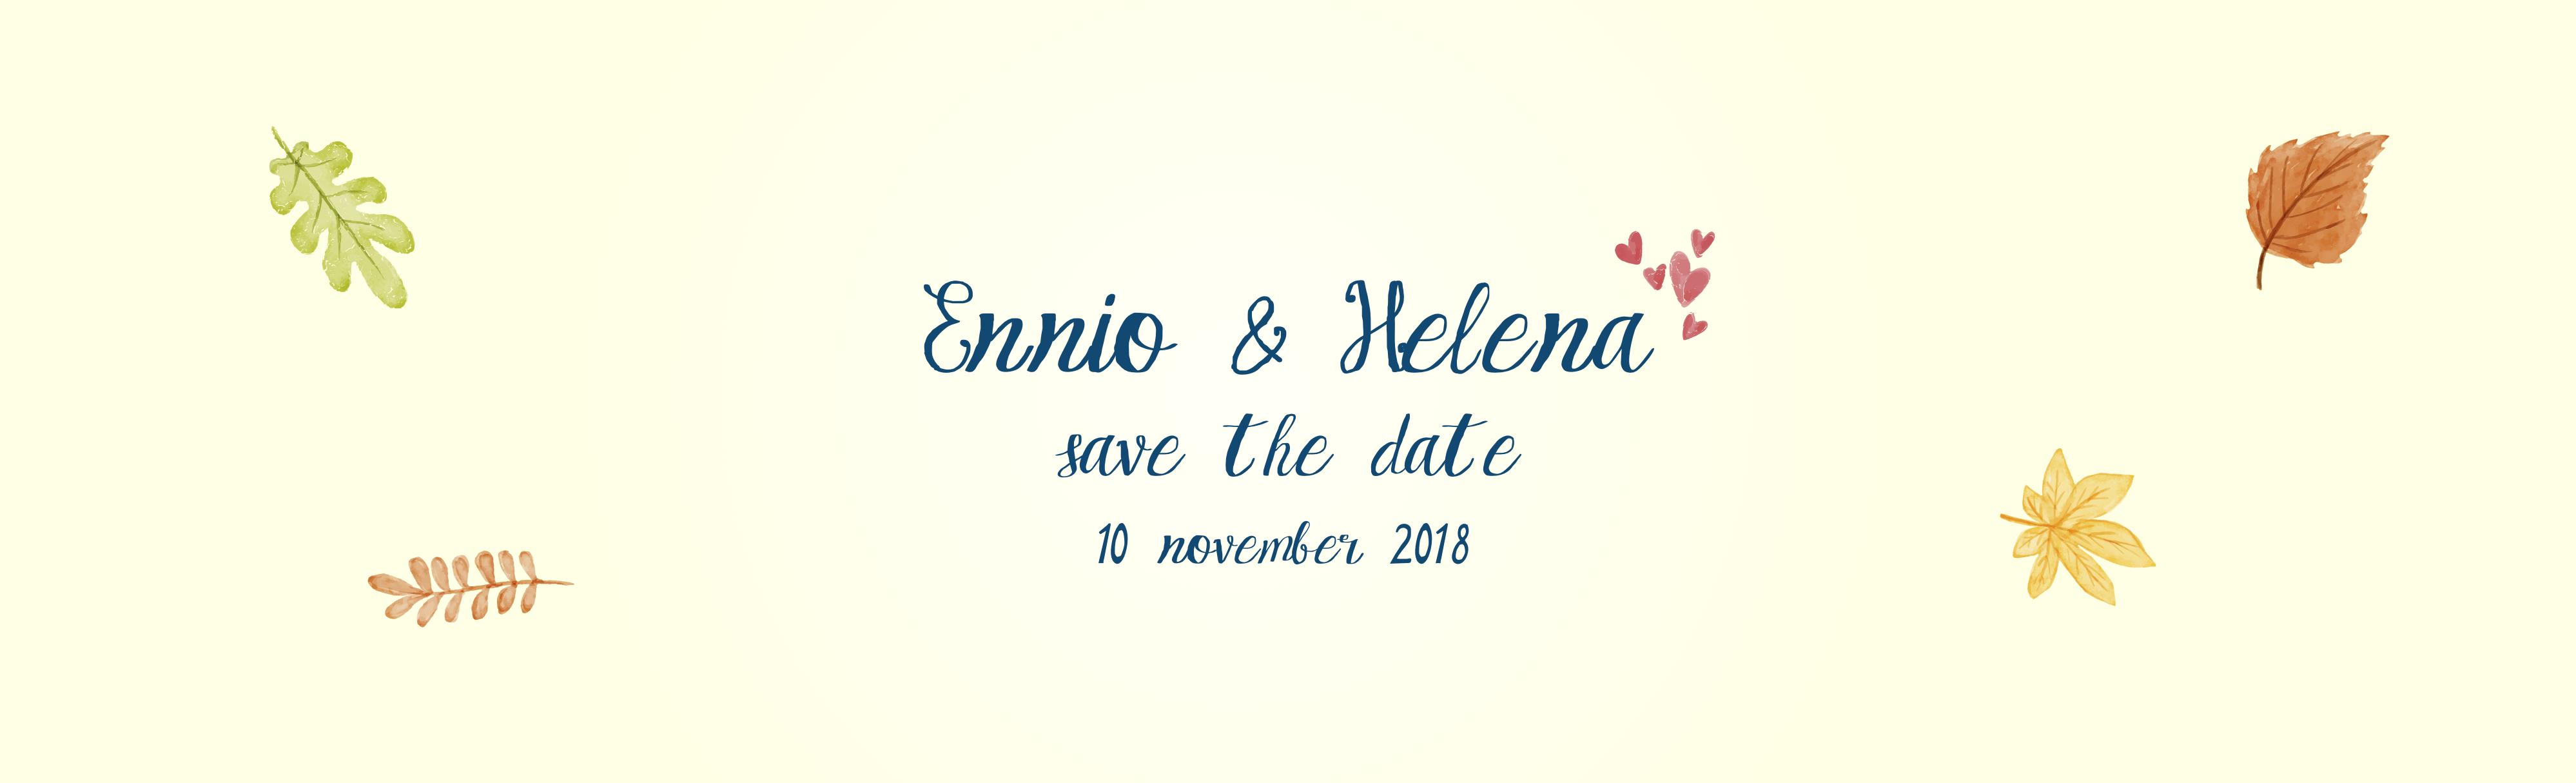 Ennio & Helena